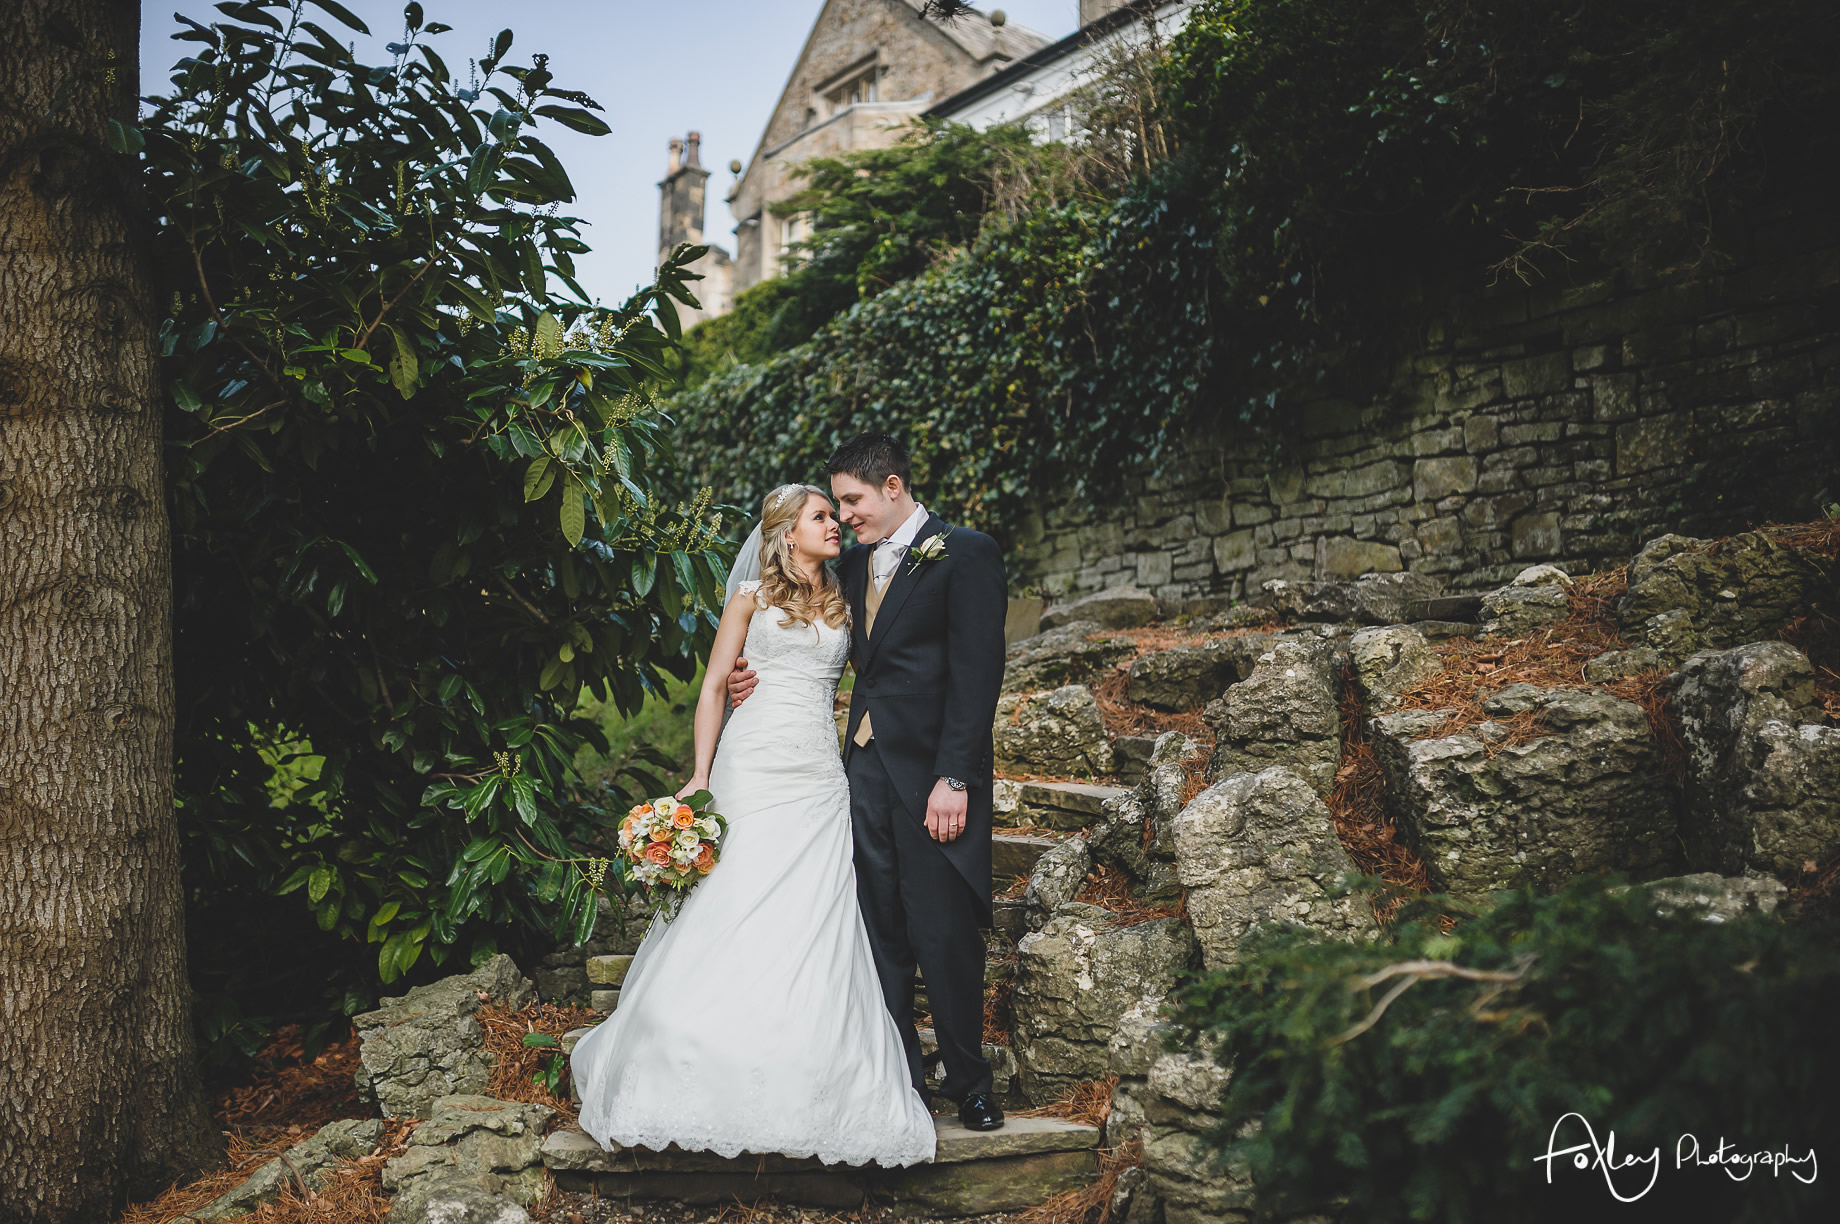 Gemma and Lewis' Wedding at Mitton Hall 108